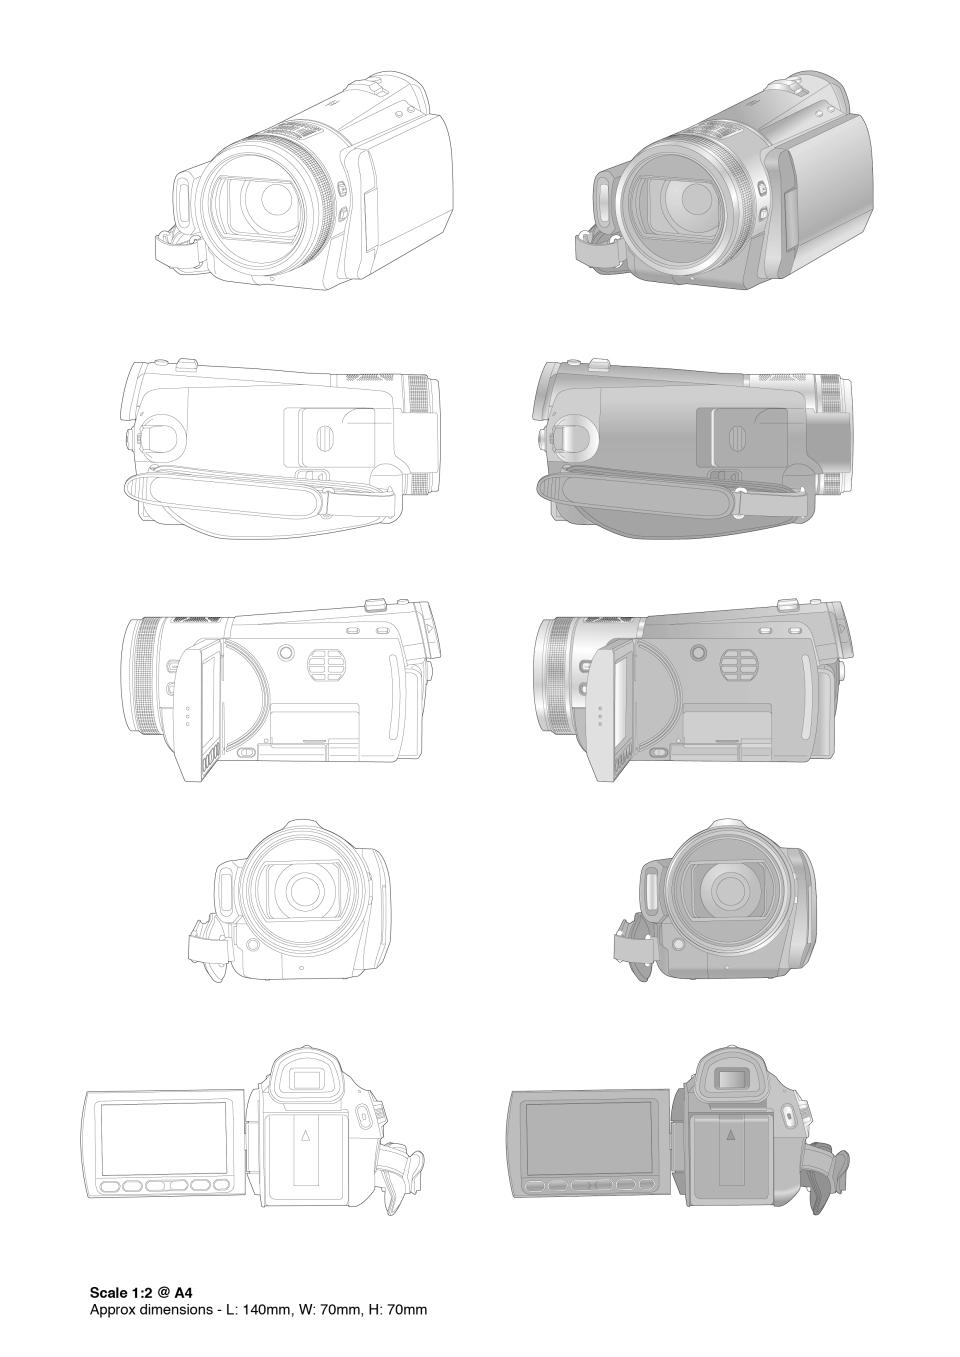 PanasonicVideoCameraDrawings-A4_1-2